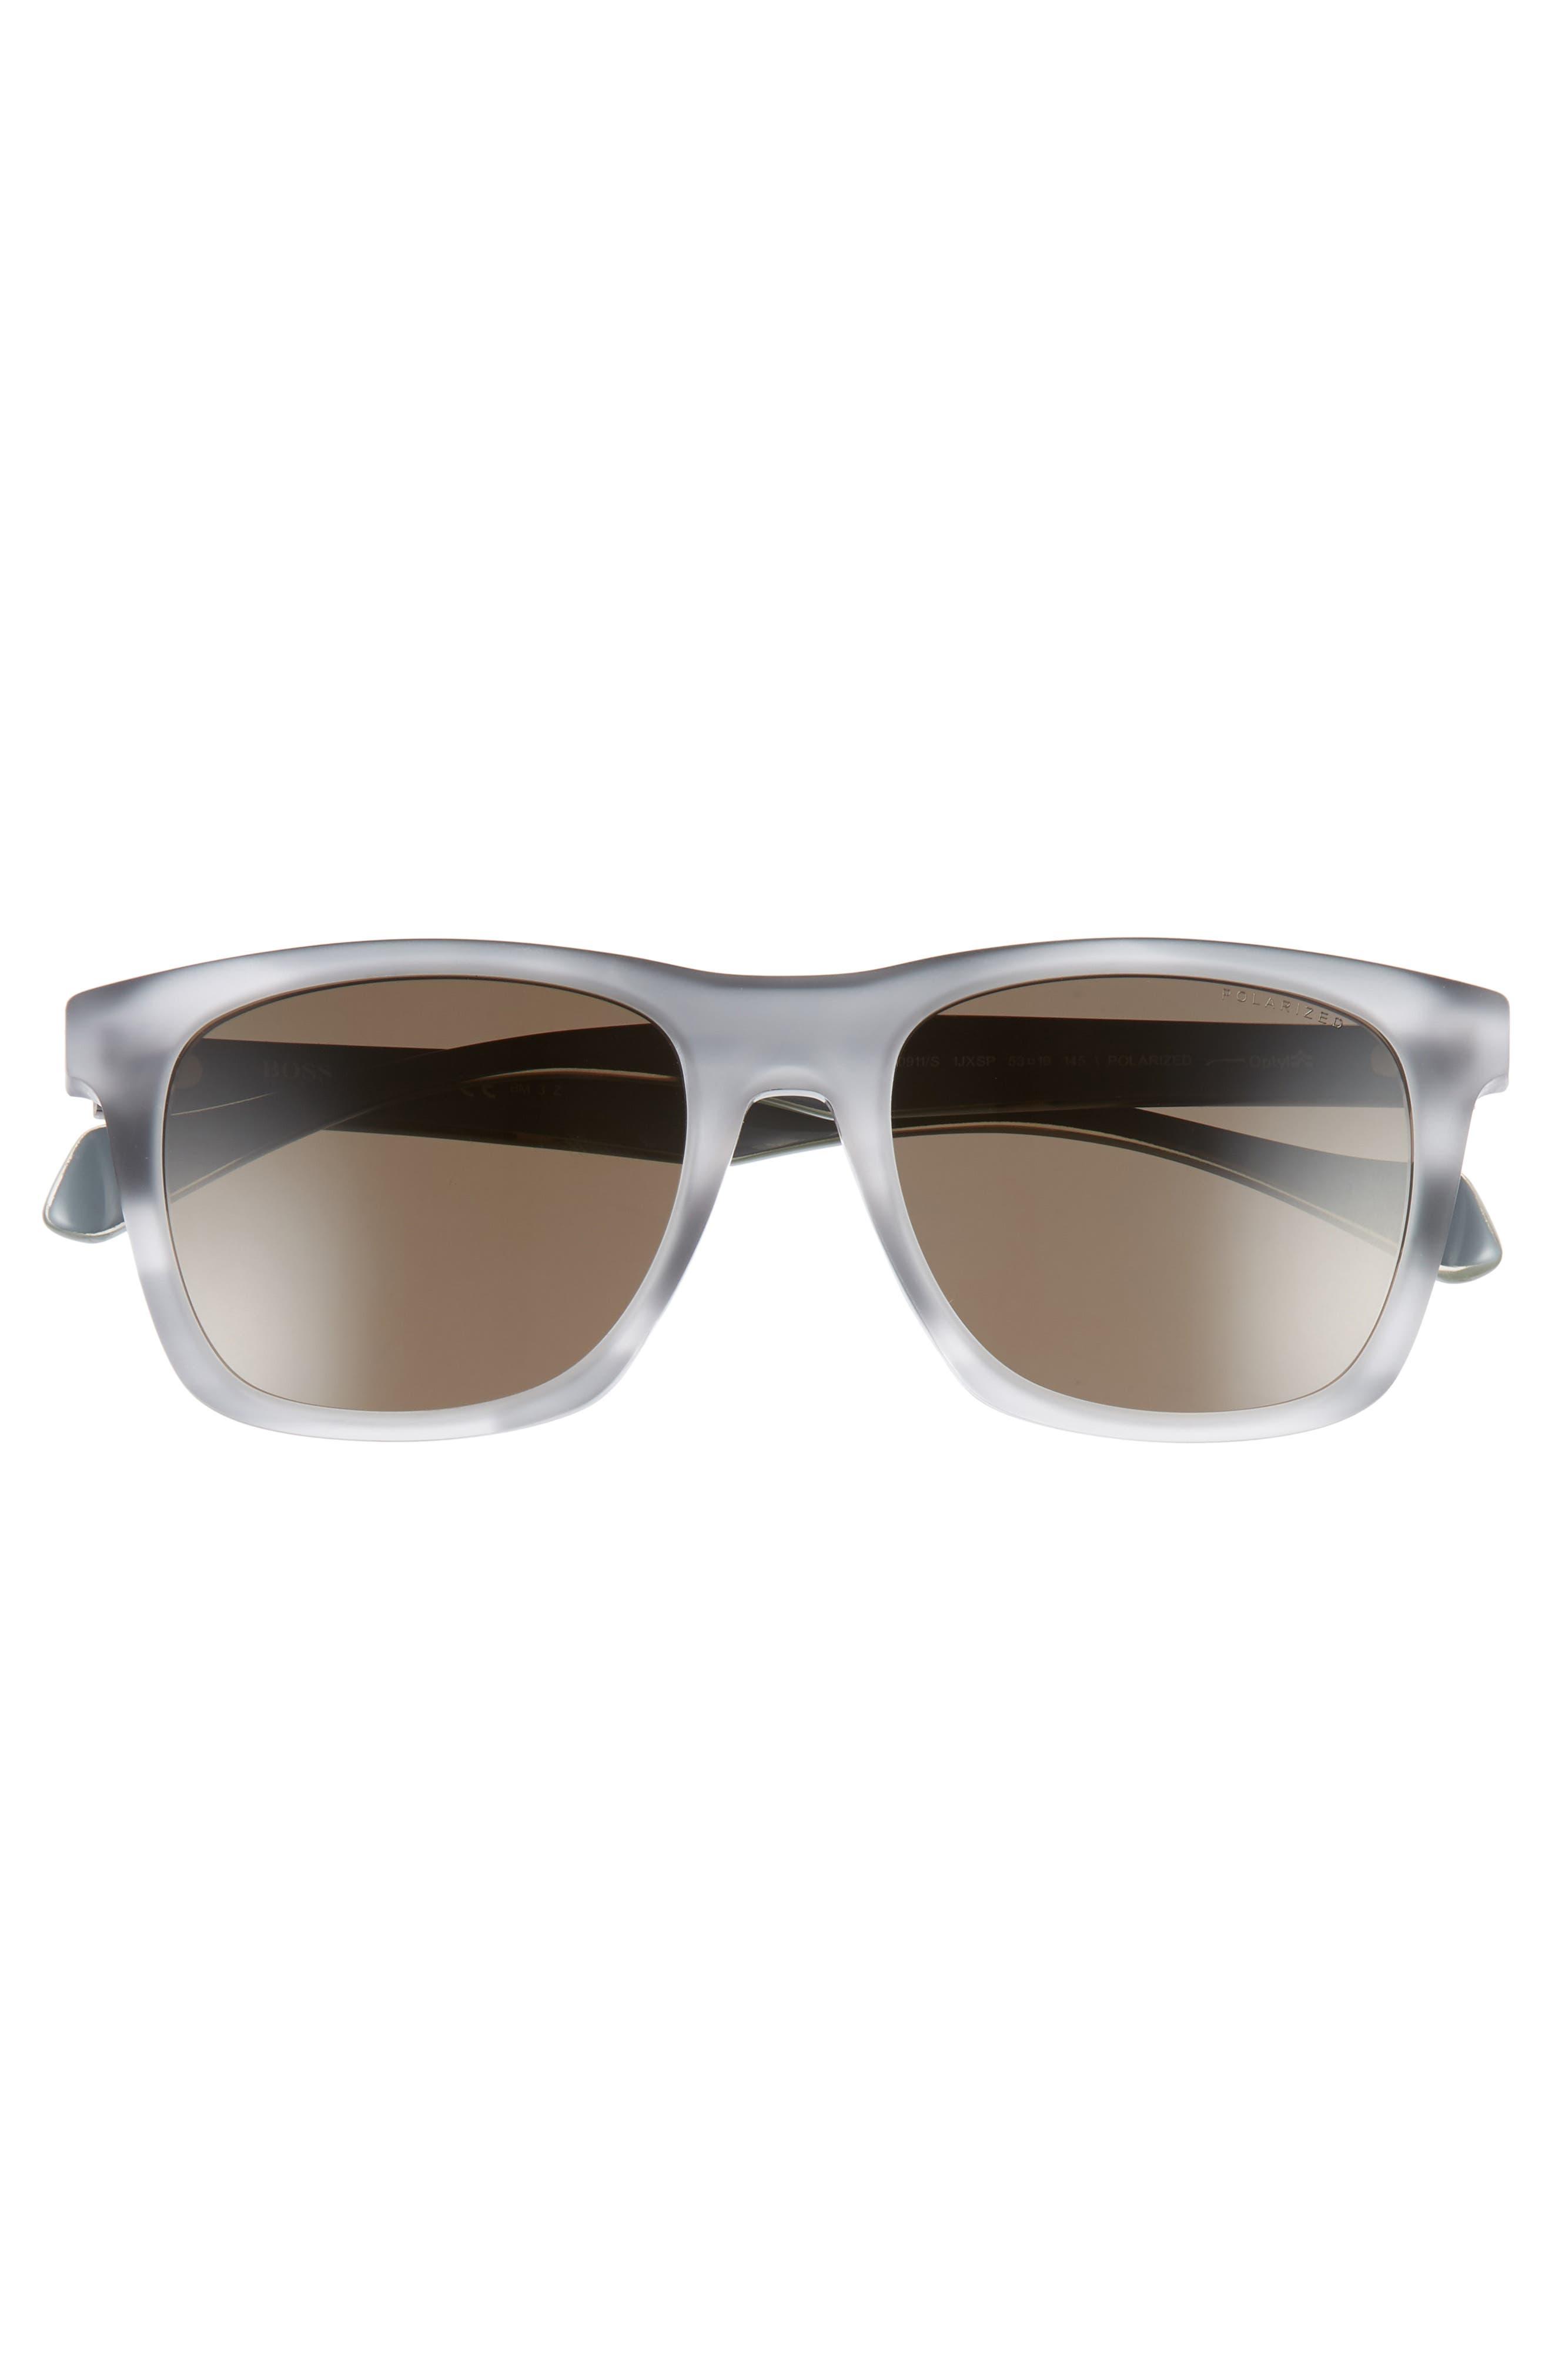 53mm Polarized Sunglasses,                             Alternate thumbnail 2, color,                             GREY/ BRONZE